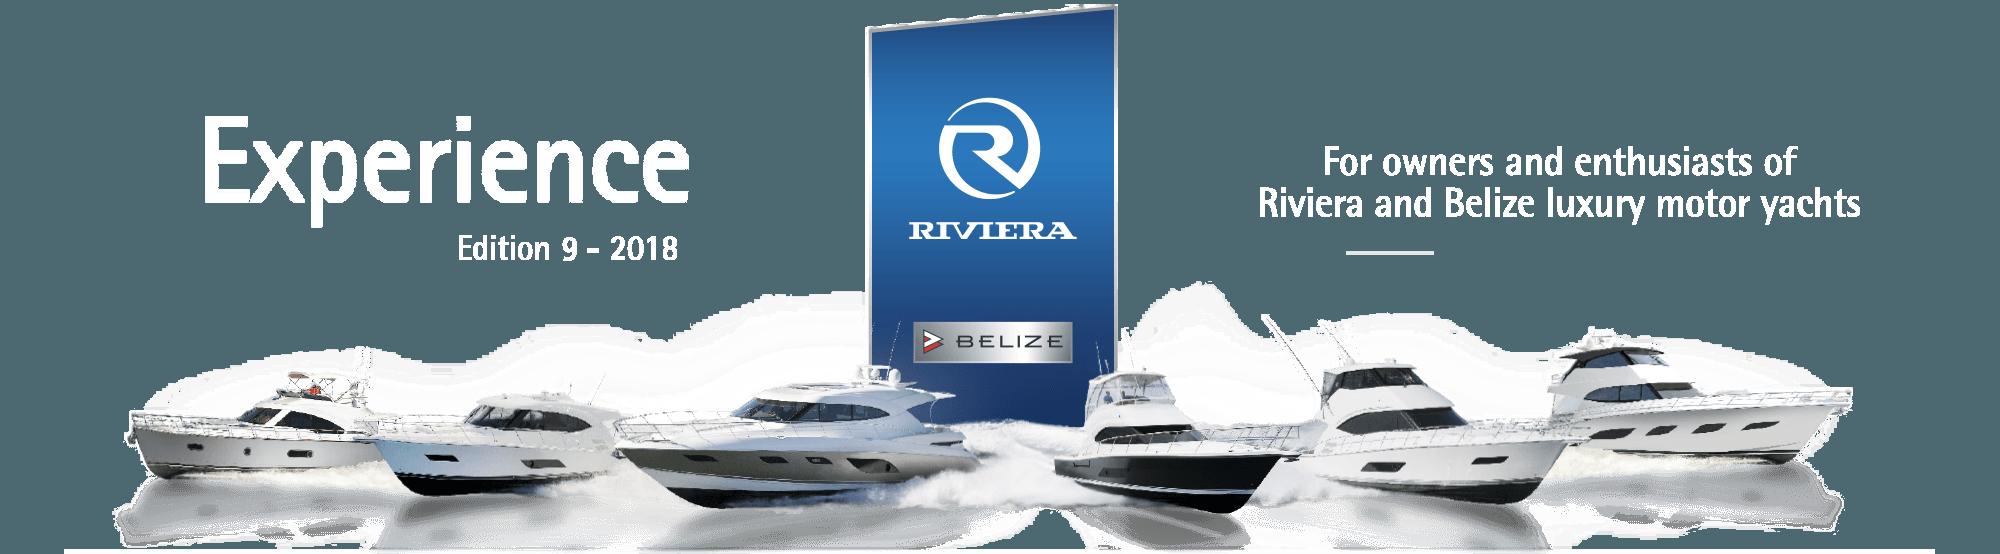 Lineup of Riviera Yachts